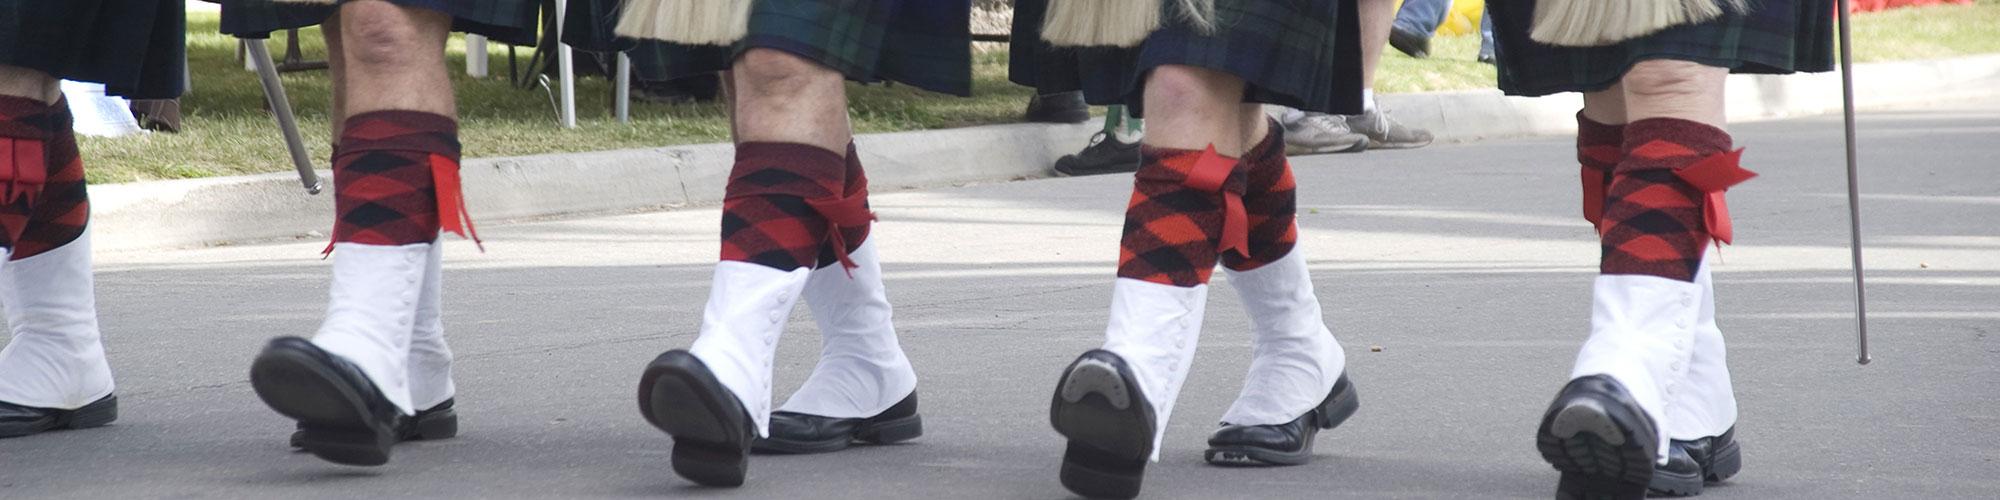 Scottish Gaelic Translators in Traditional Footwear